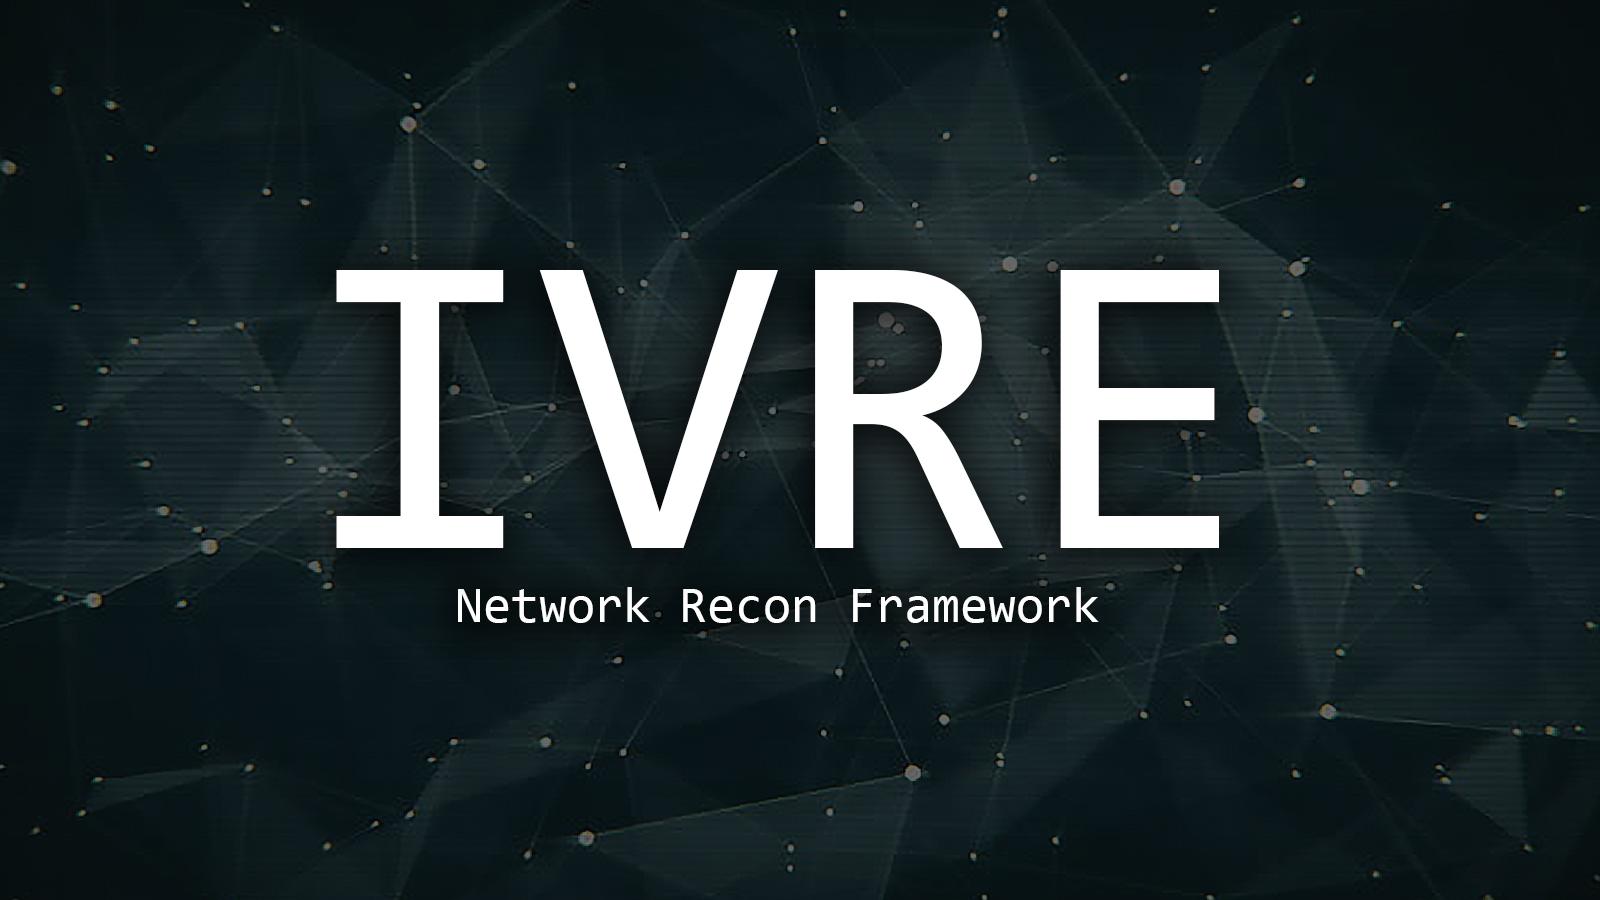 IVRE - Network Recon Framework